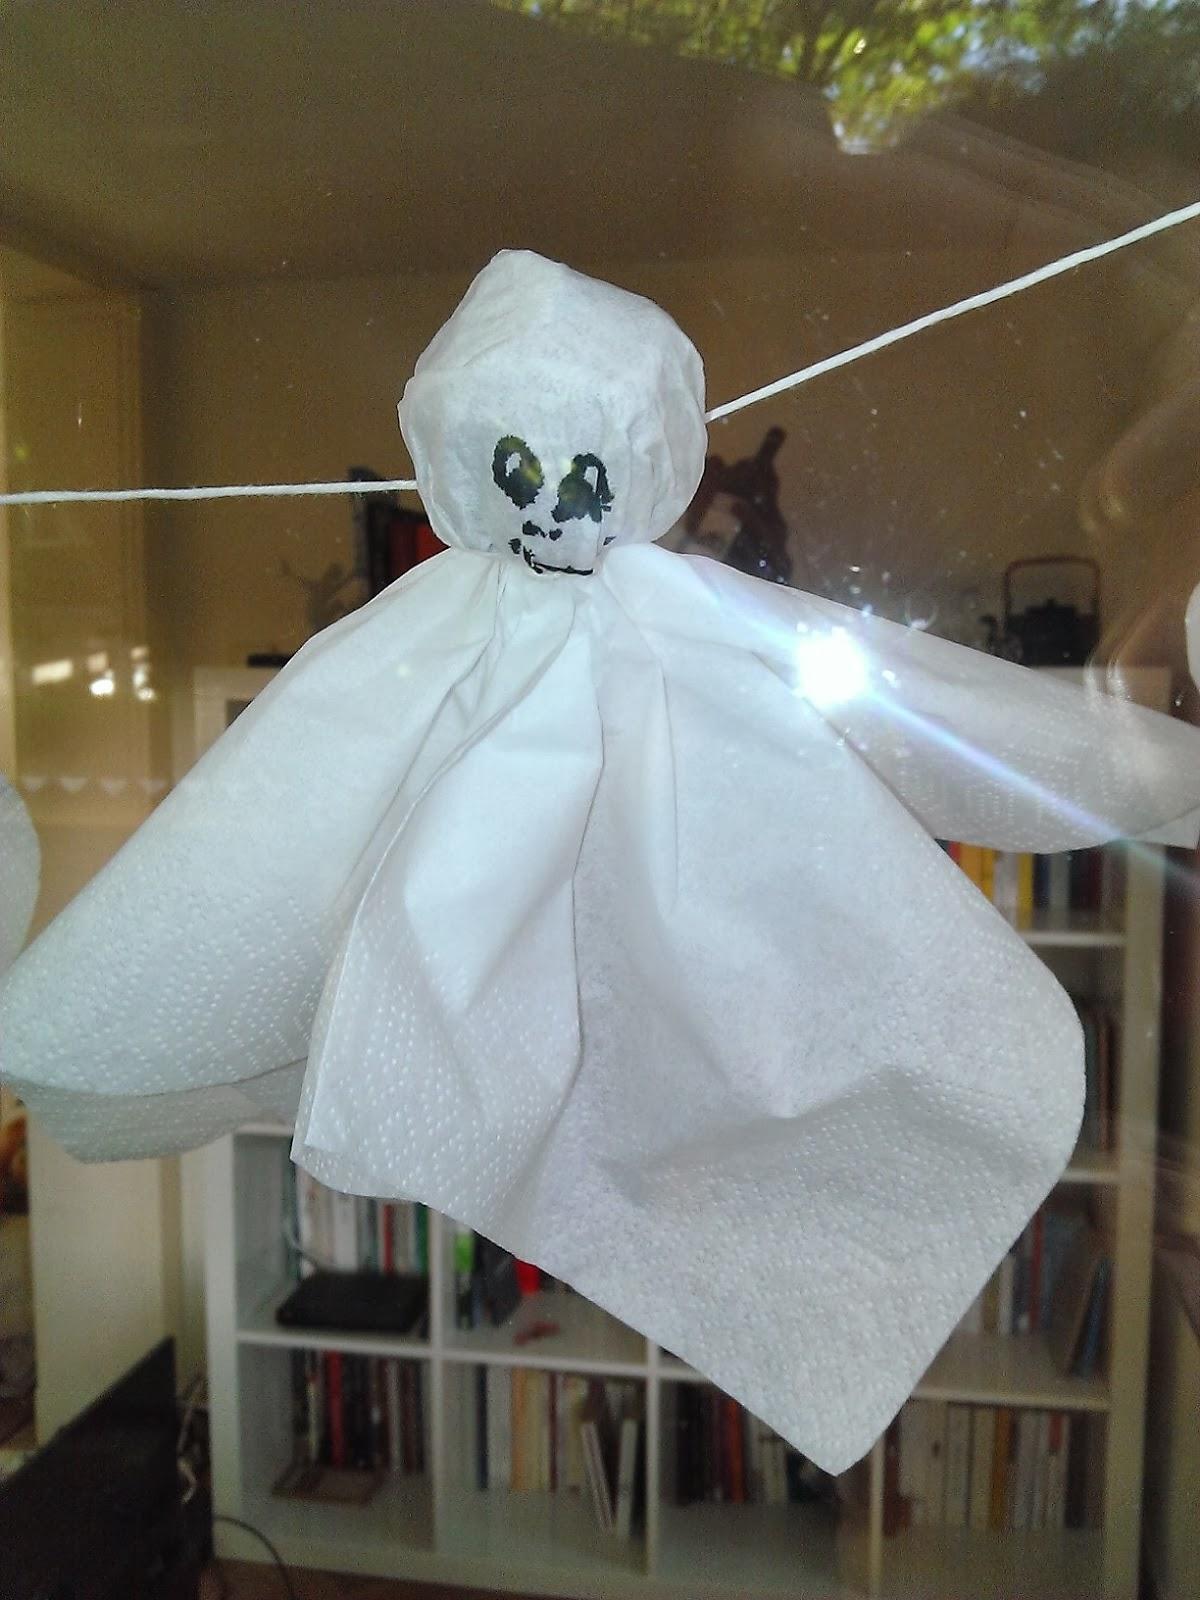 decorazioni per halloween bambini: halloween ricette bambini ... - Decorazioni Per Finestre Halloween